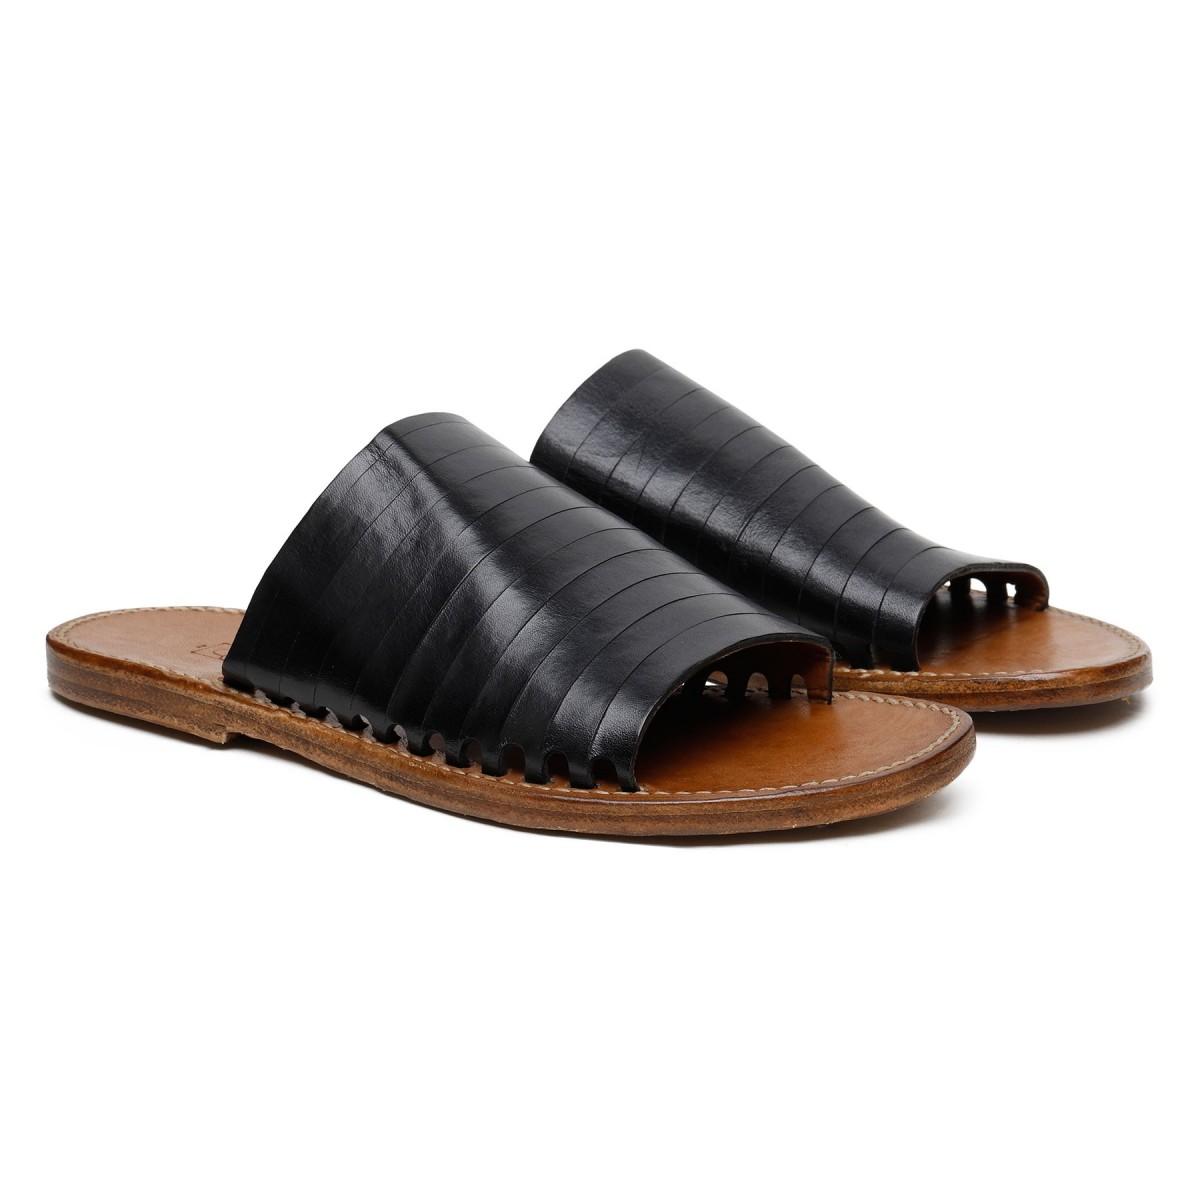 Sandali bassi in pelle nera